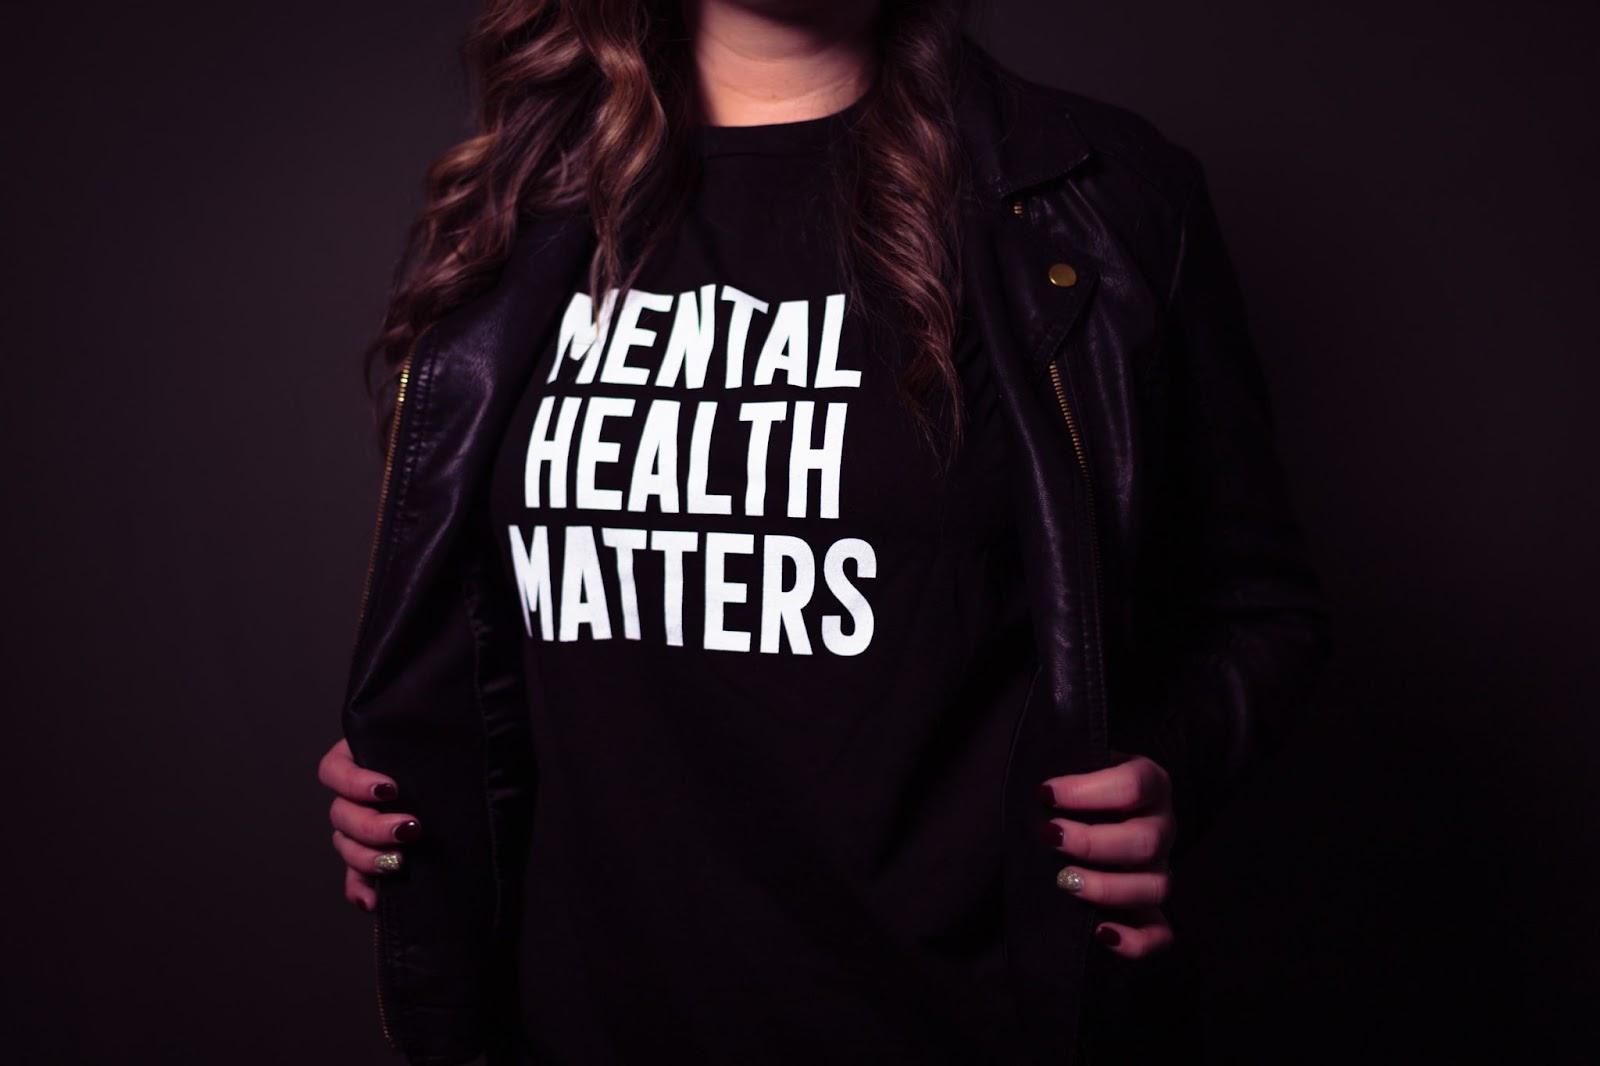 """mental health matters"" t-shirt"